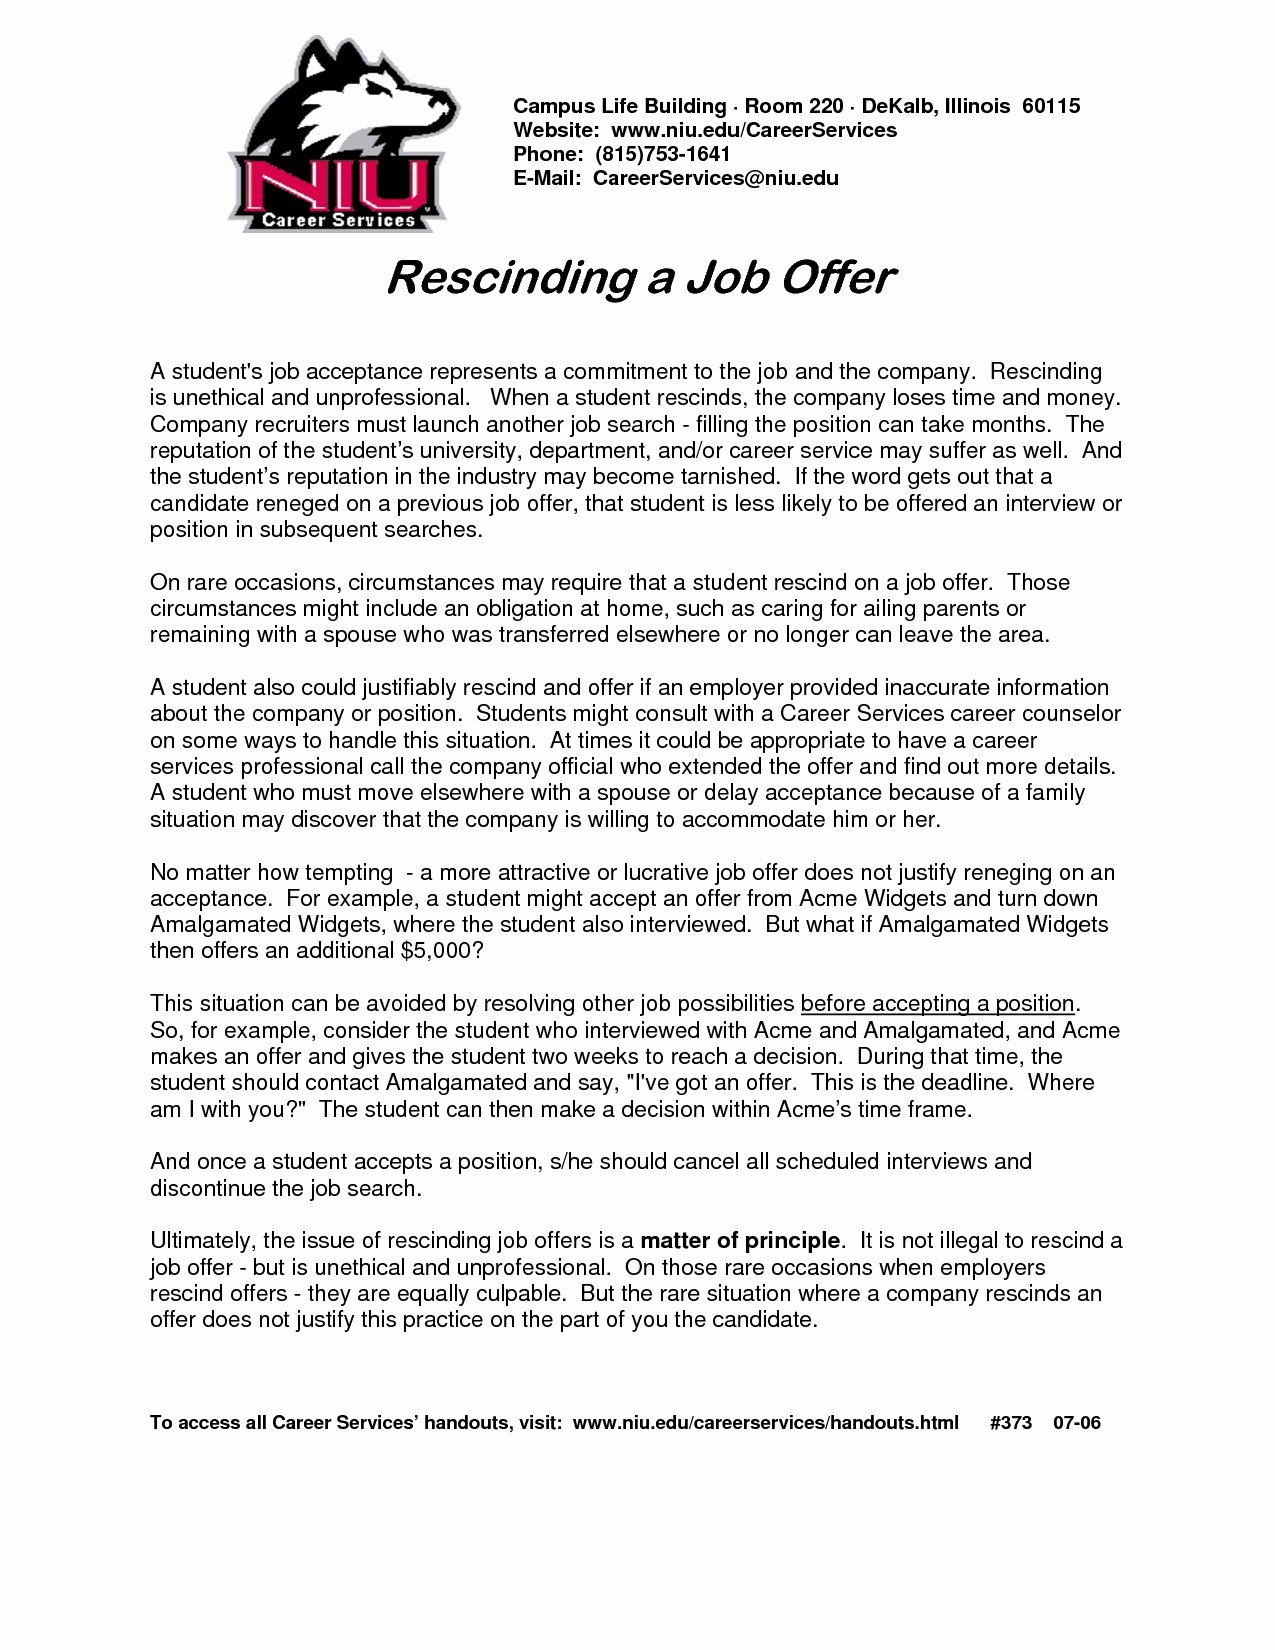 Letter Of Rescission Template Unique Rescind Offer Letter Pelosleclaire